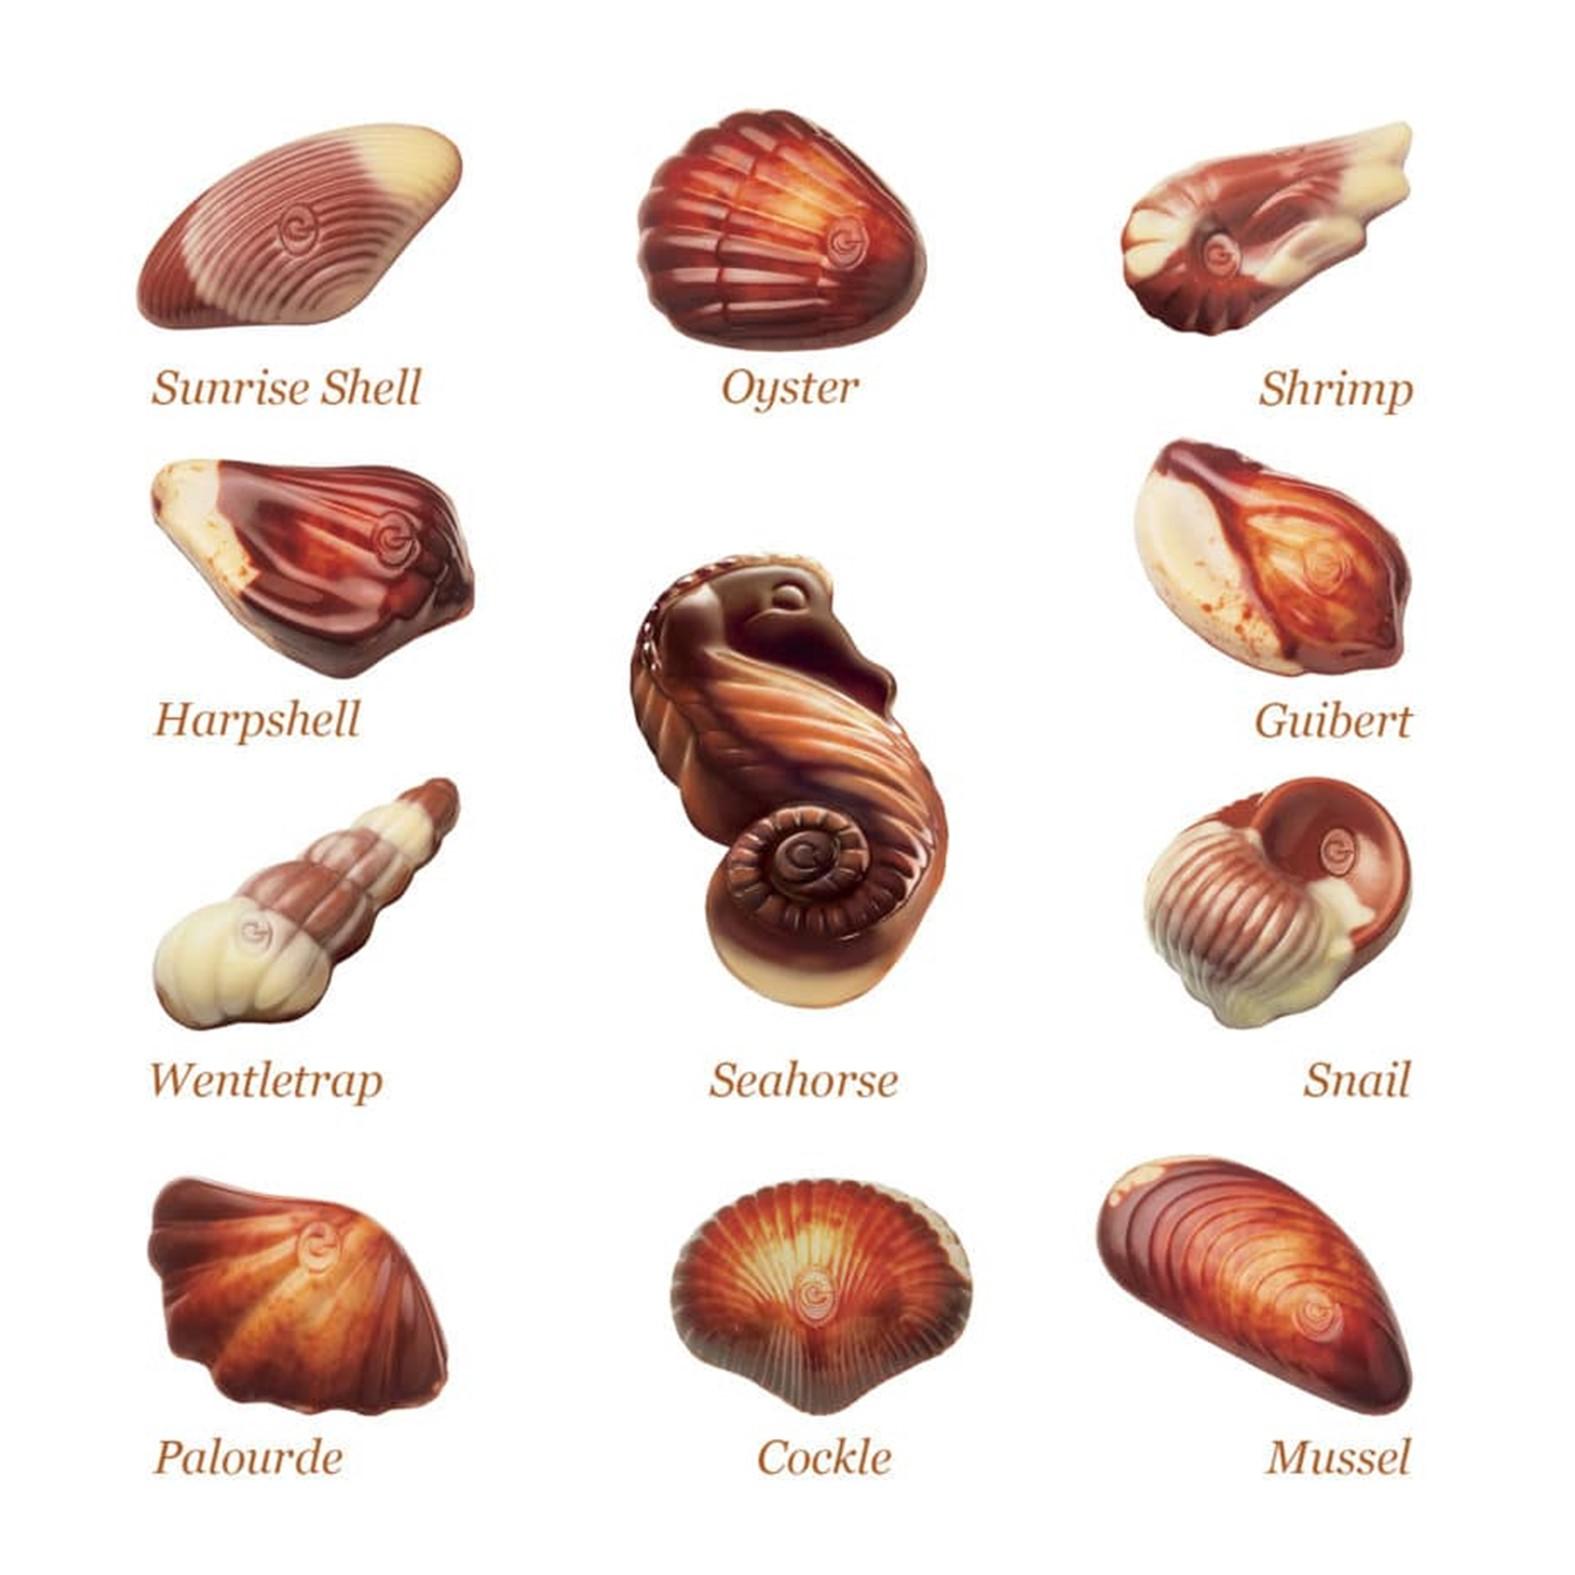 Guylian Bombones de Chocolate - The Original Sea Shell- Image 3